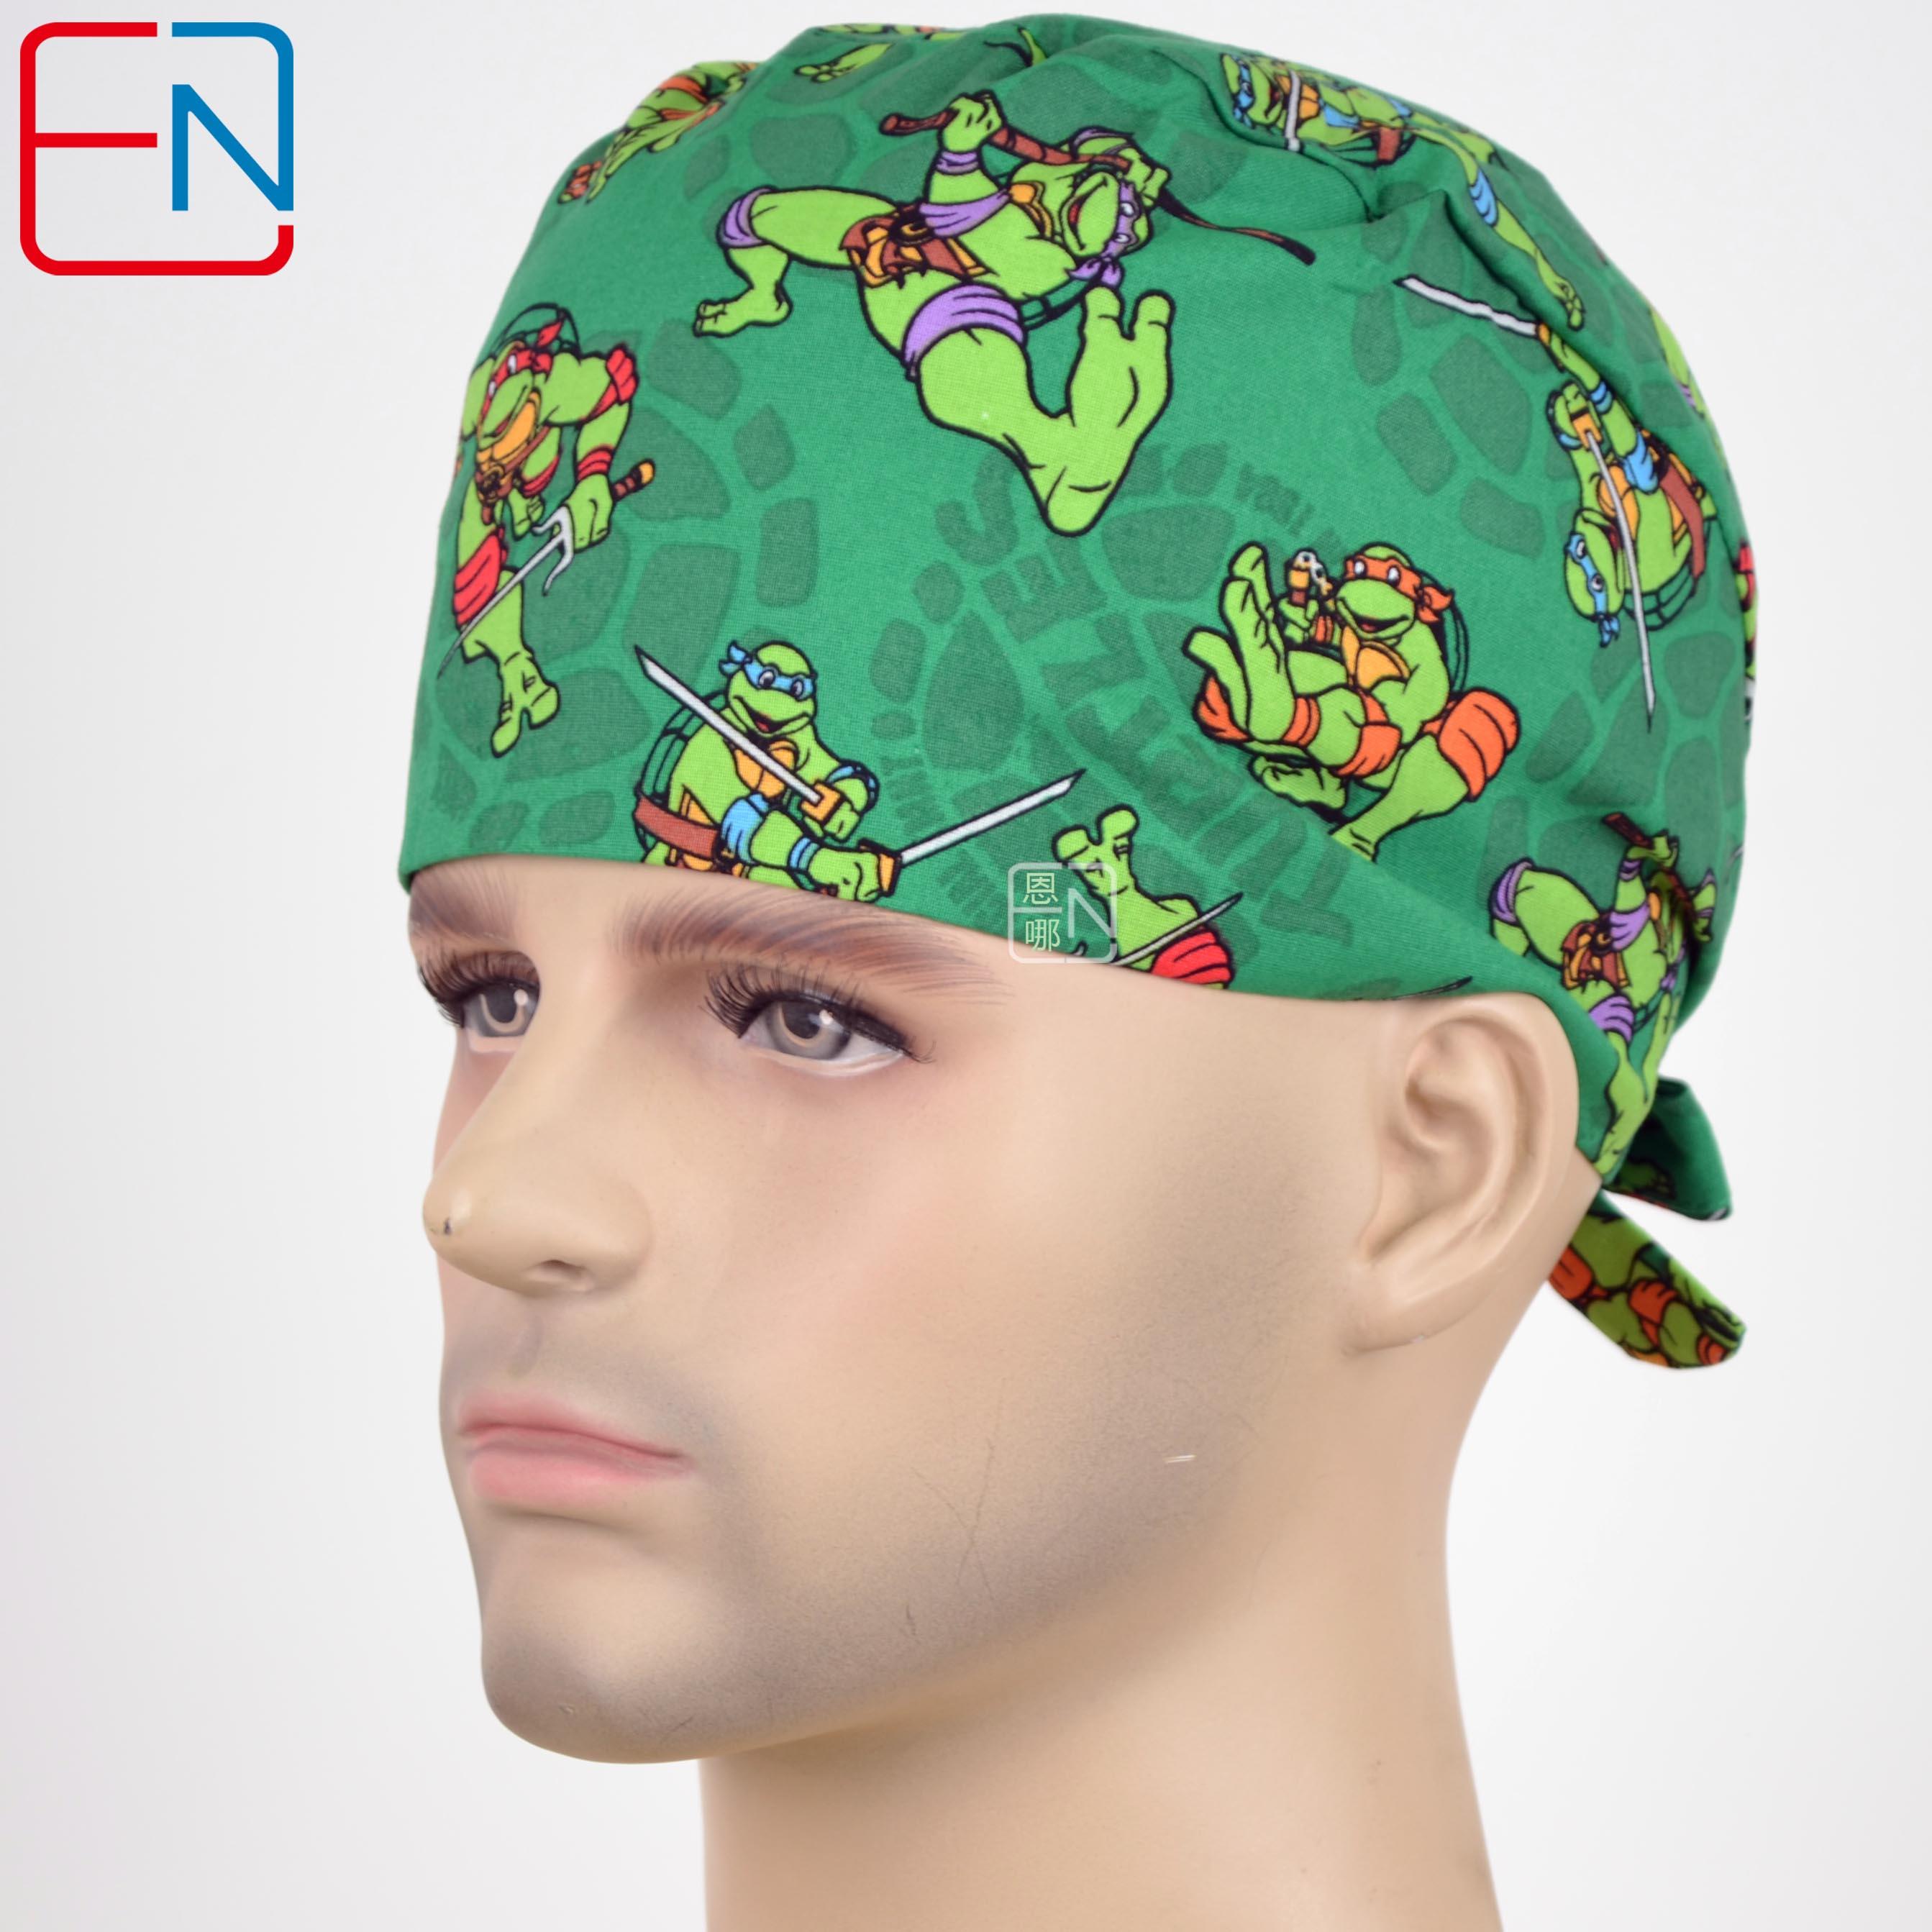 Surgical Caps Surgery Cap  Surgical Hats Medical Caps For Men And Men Scrub Caps